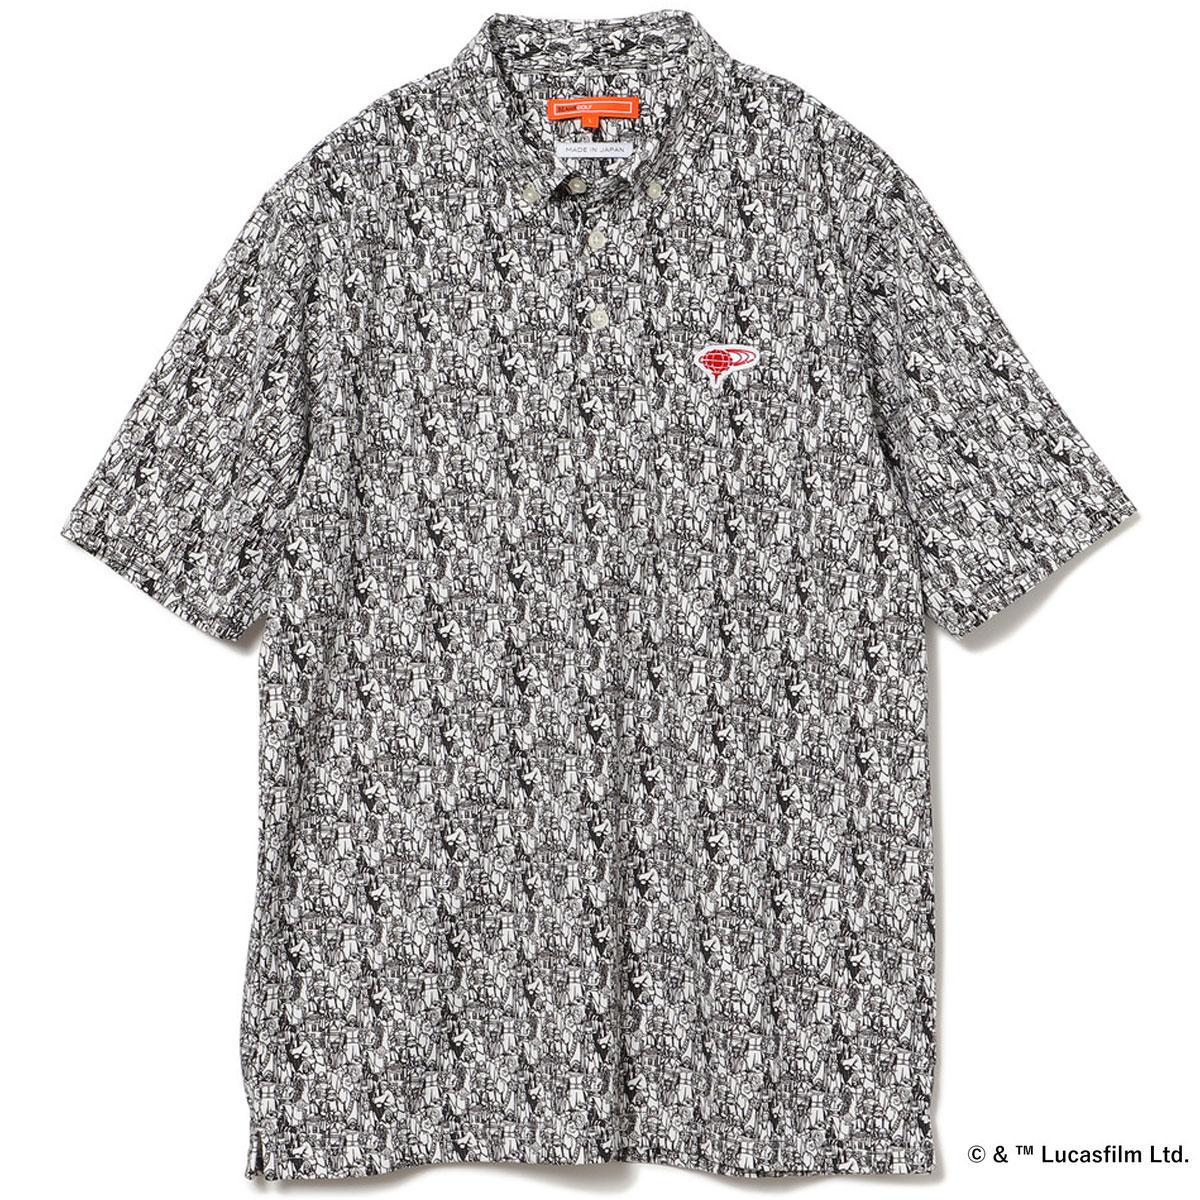 STAR WARS BEAMS GOLF 別注 総柄ポロシャツ